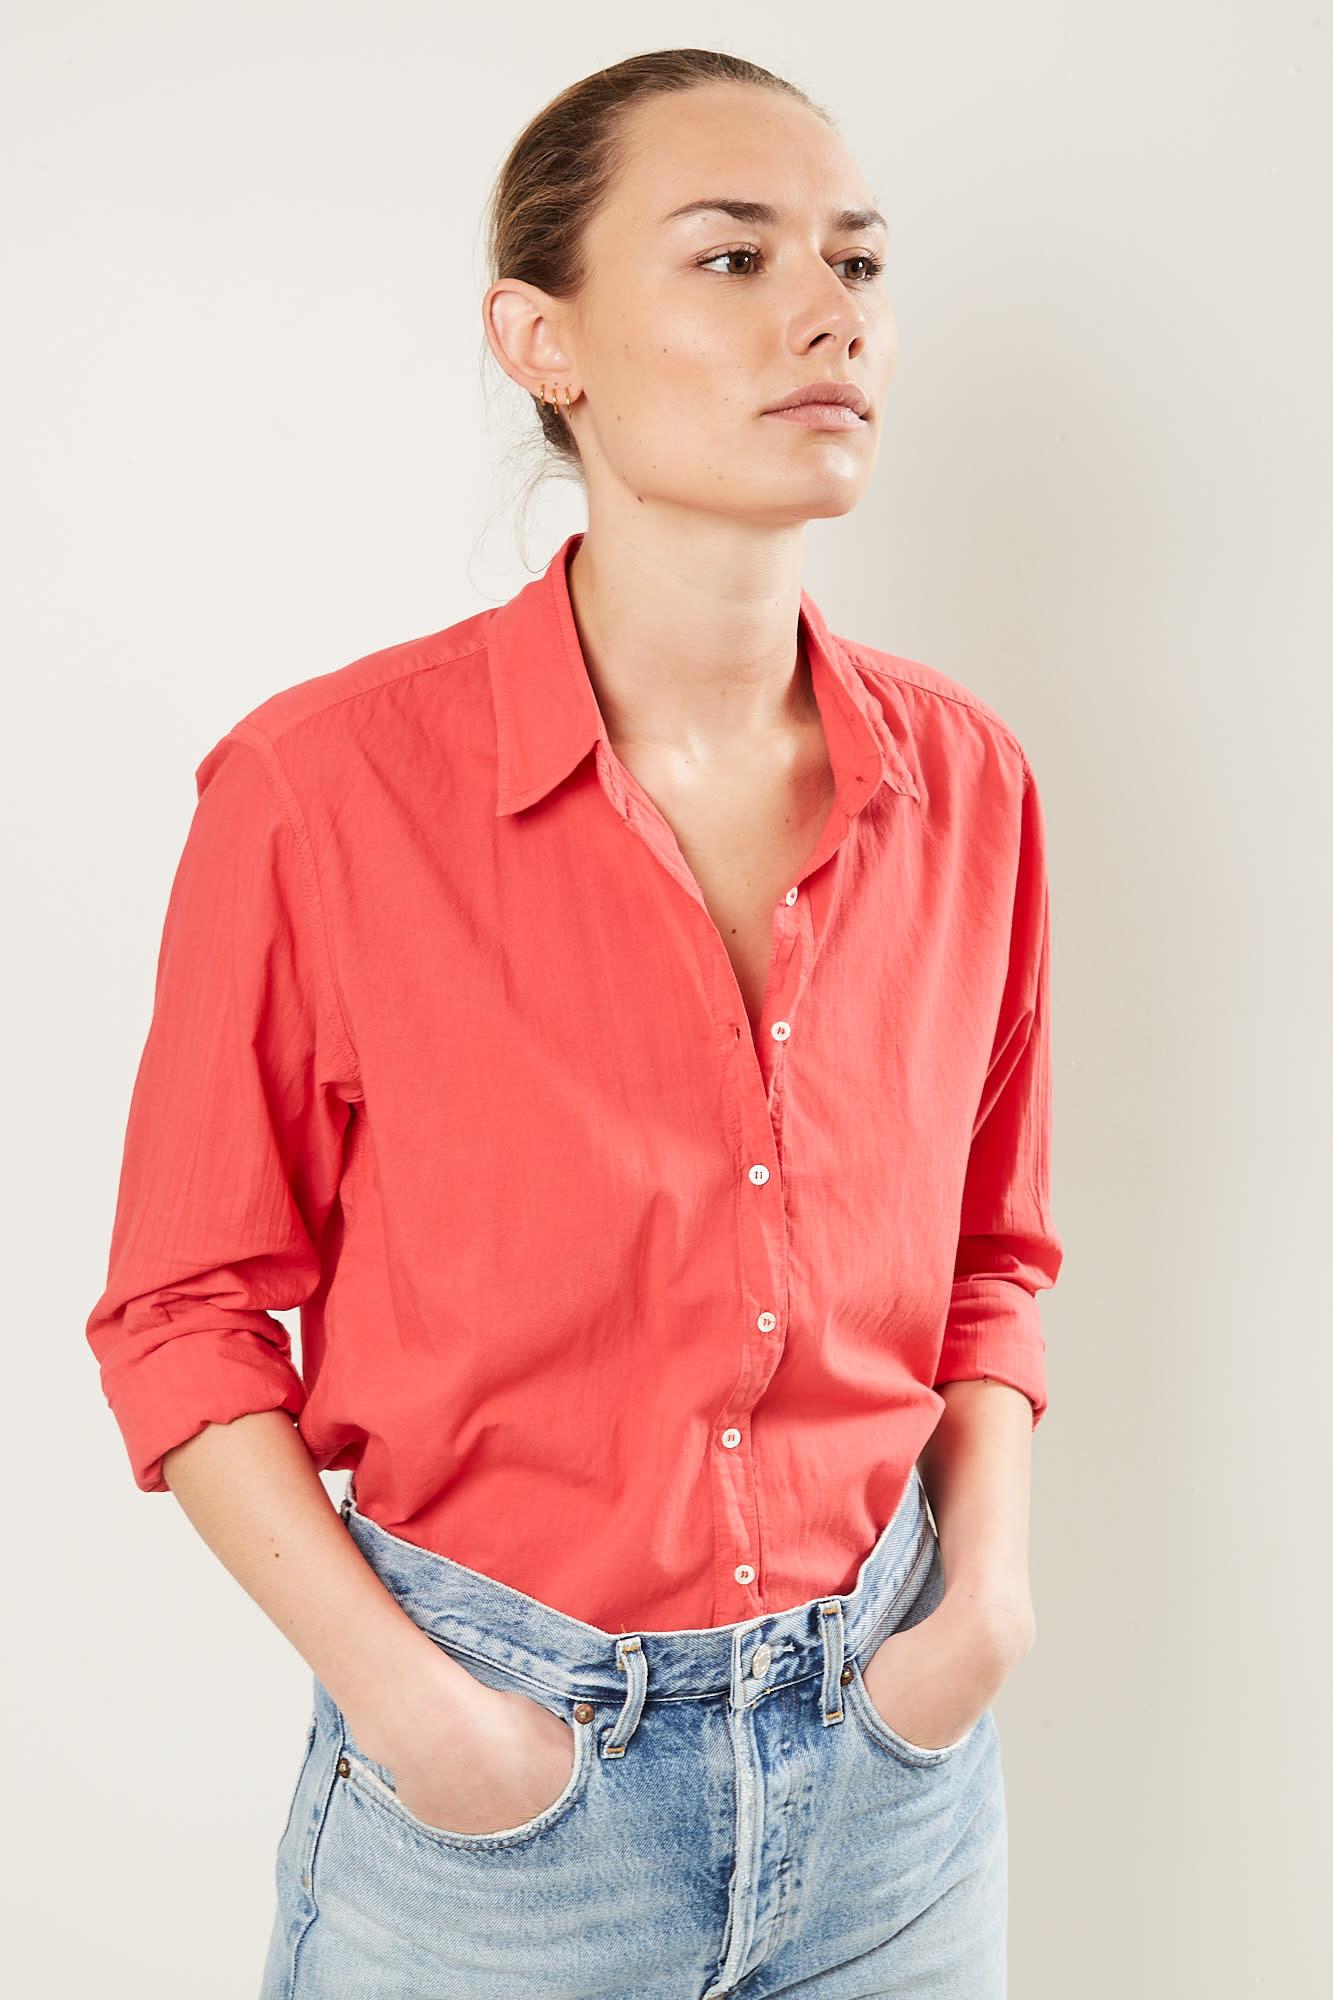 Xirena - Beau cotton poplin shirt old flame